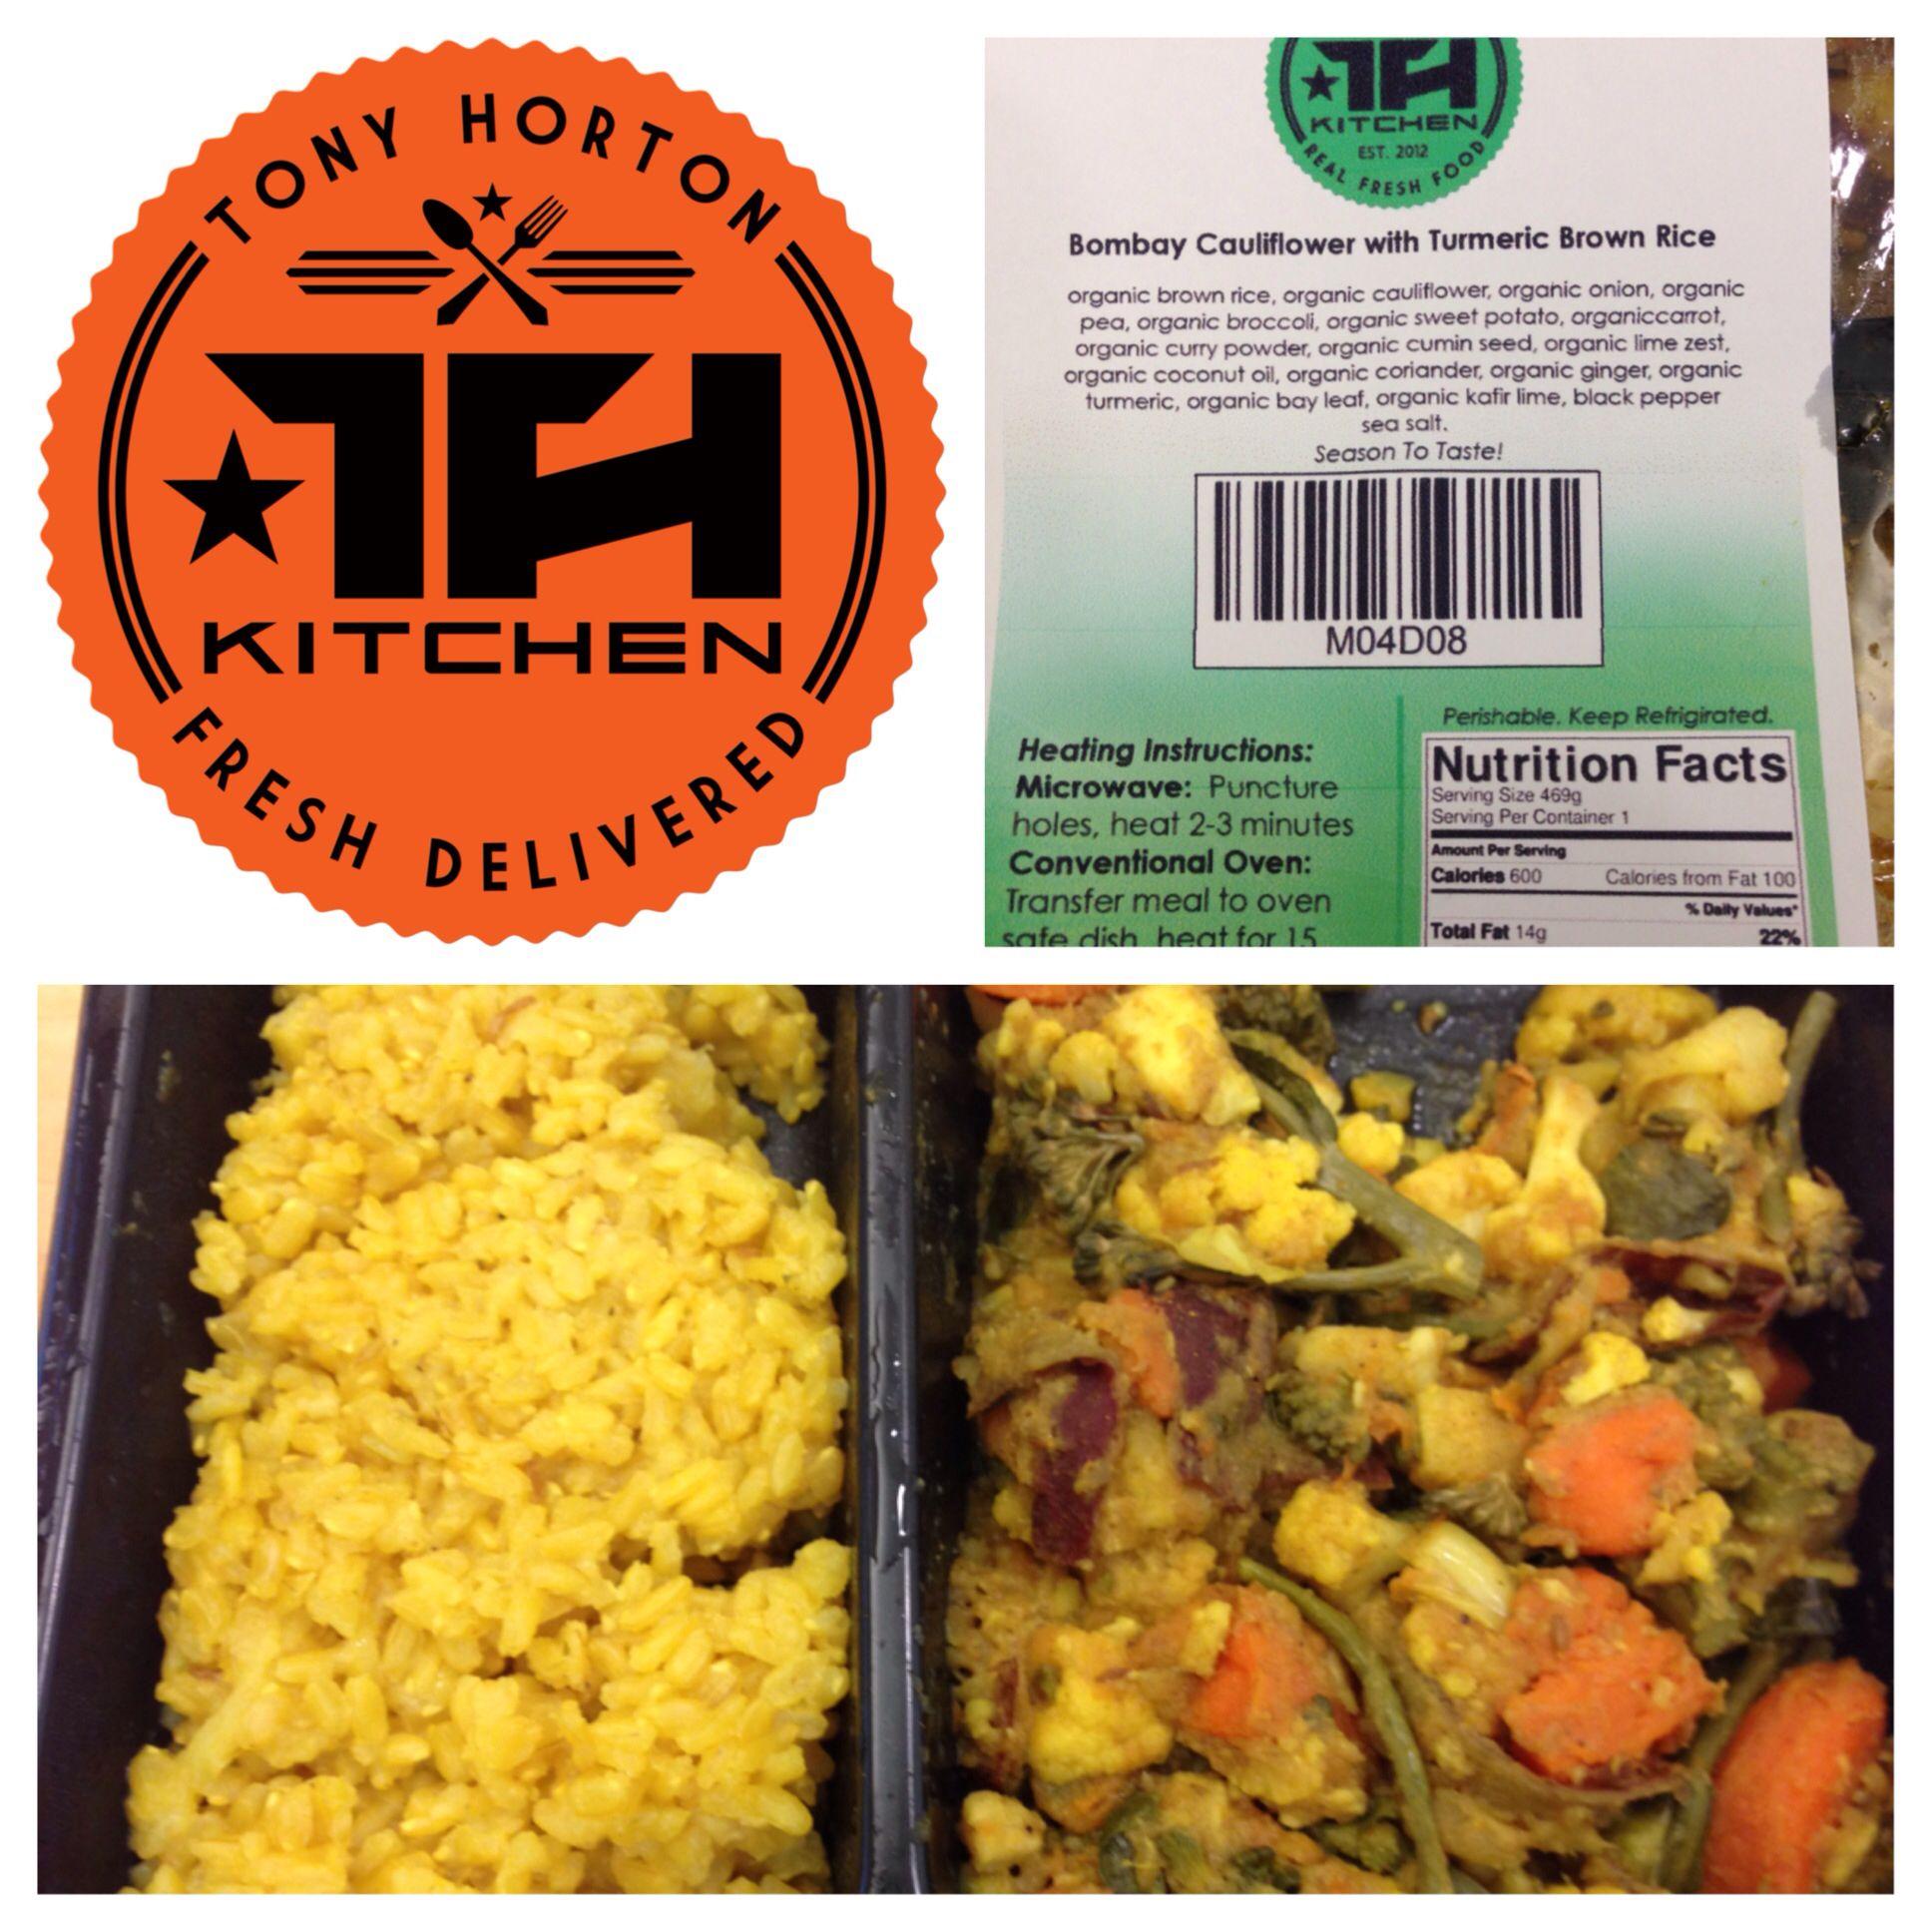 Tony Horton Kitchen   Bombay Cauliflower With Turmeric Brown Rice!